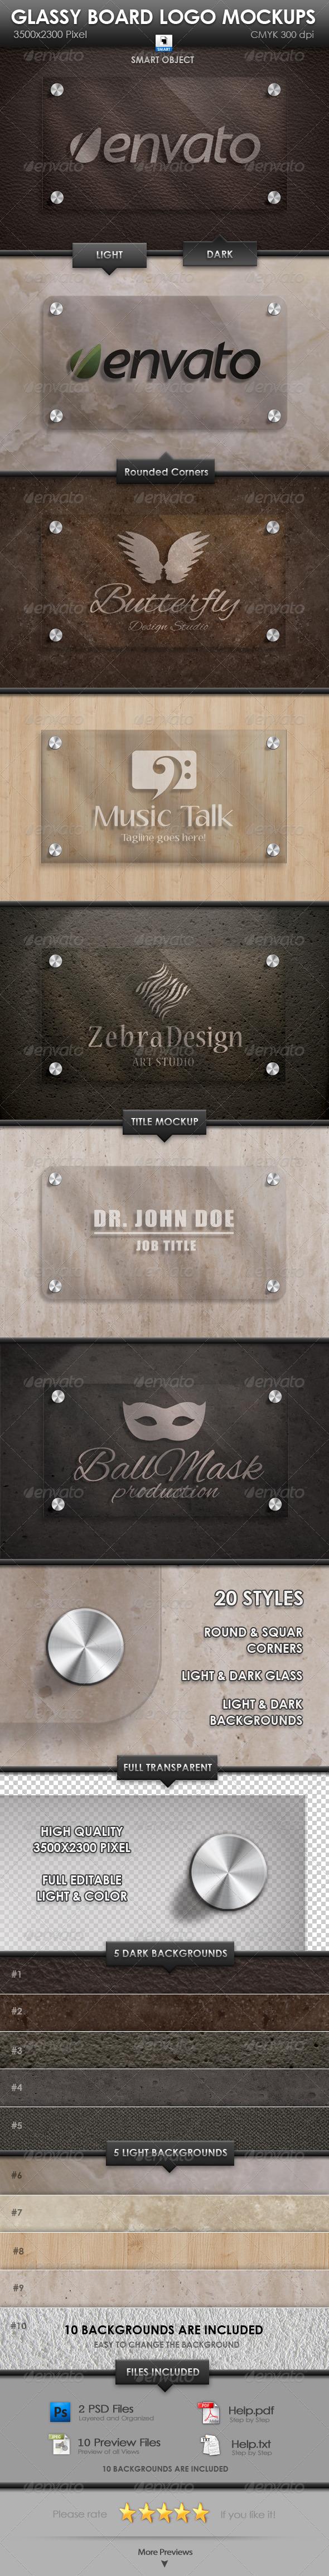 GraphicRiver Glassy Board Logo Mockups 3298366